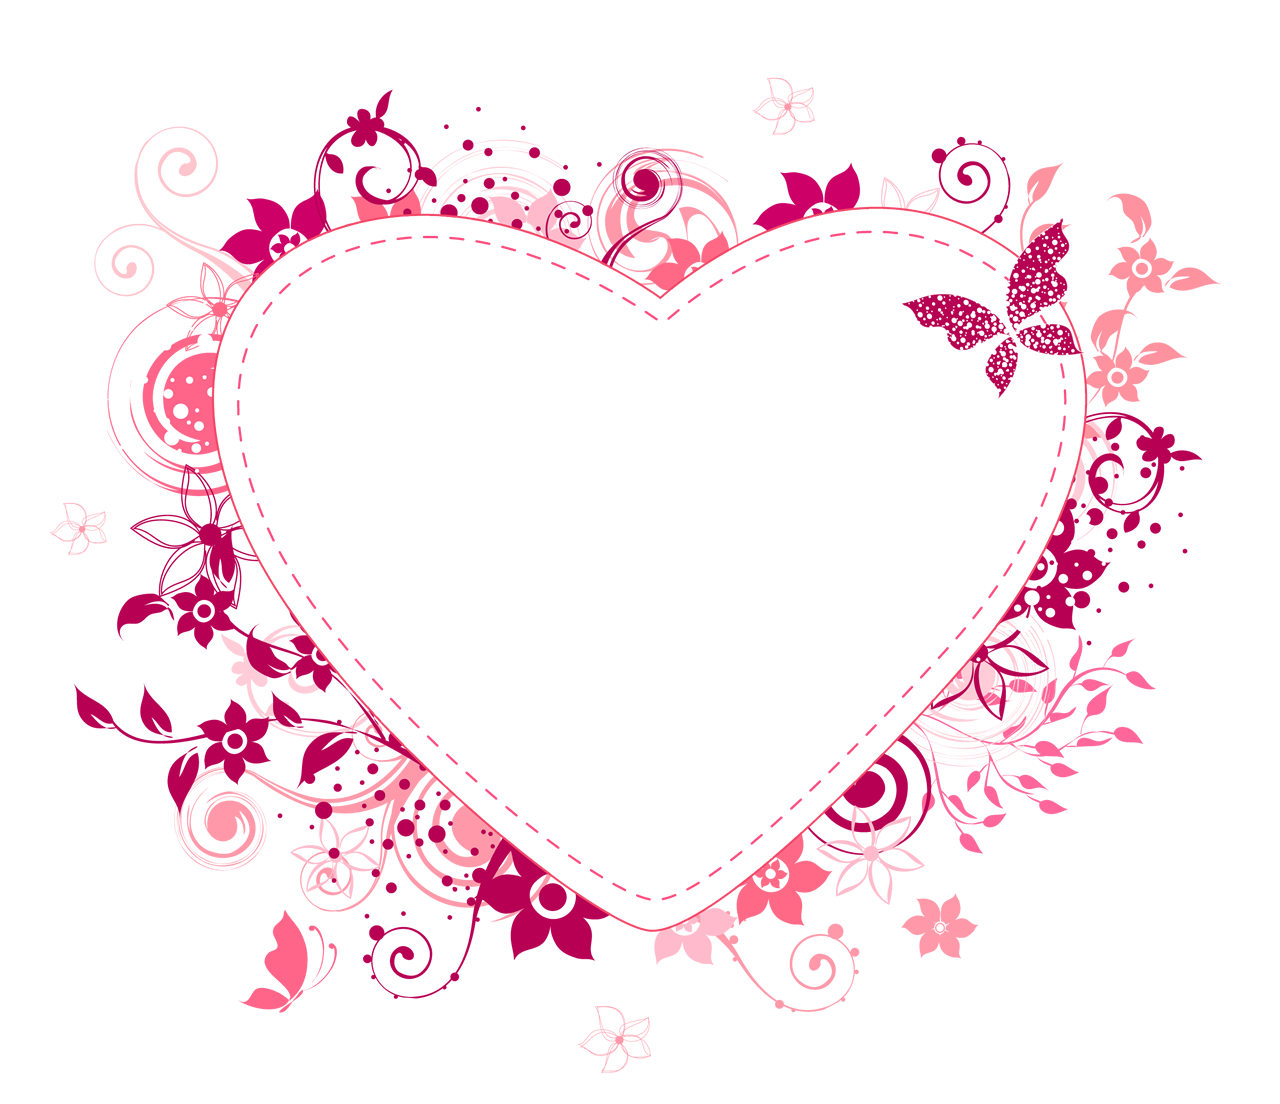 Corazón de flores rosa